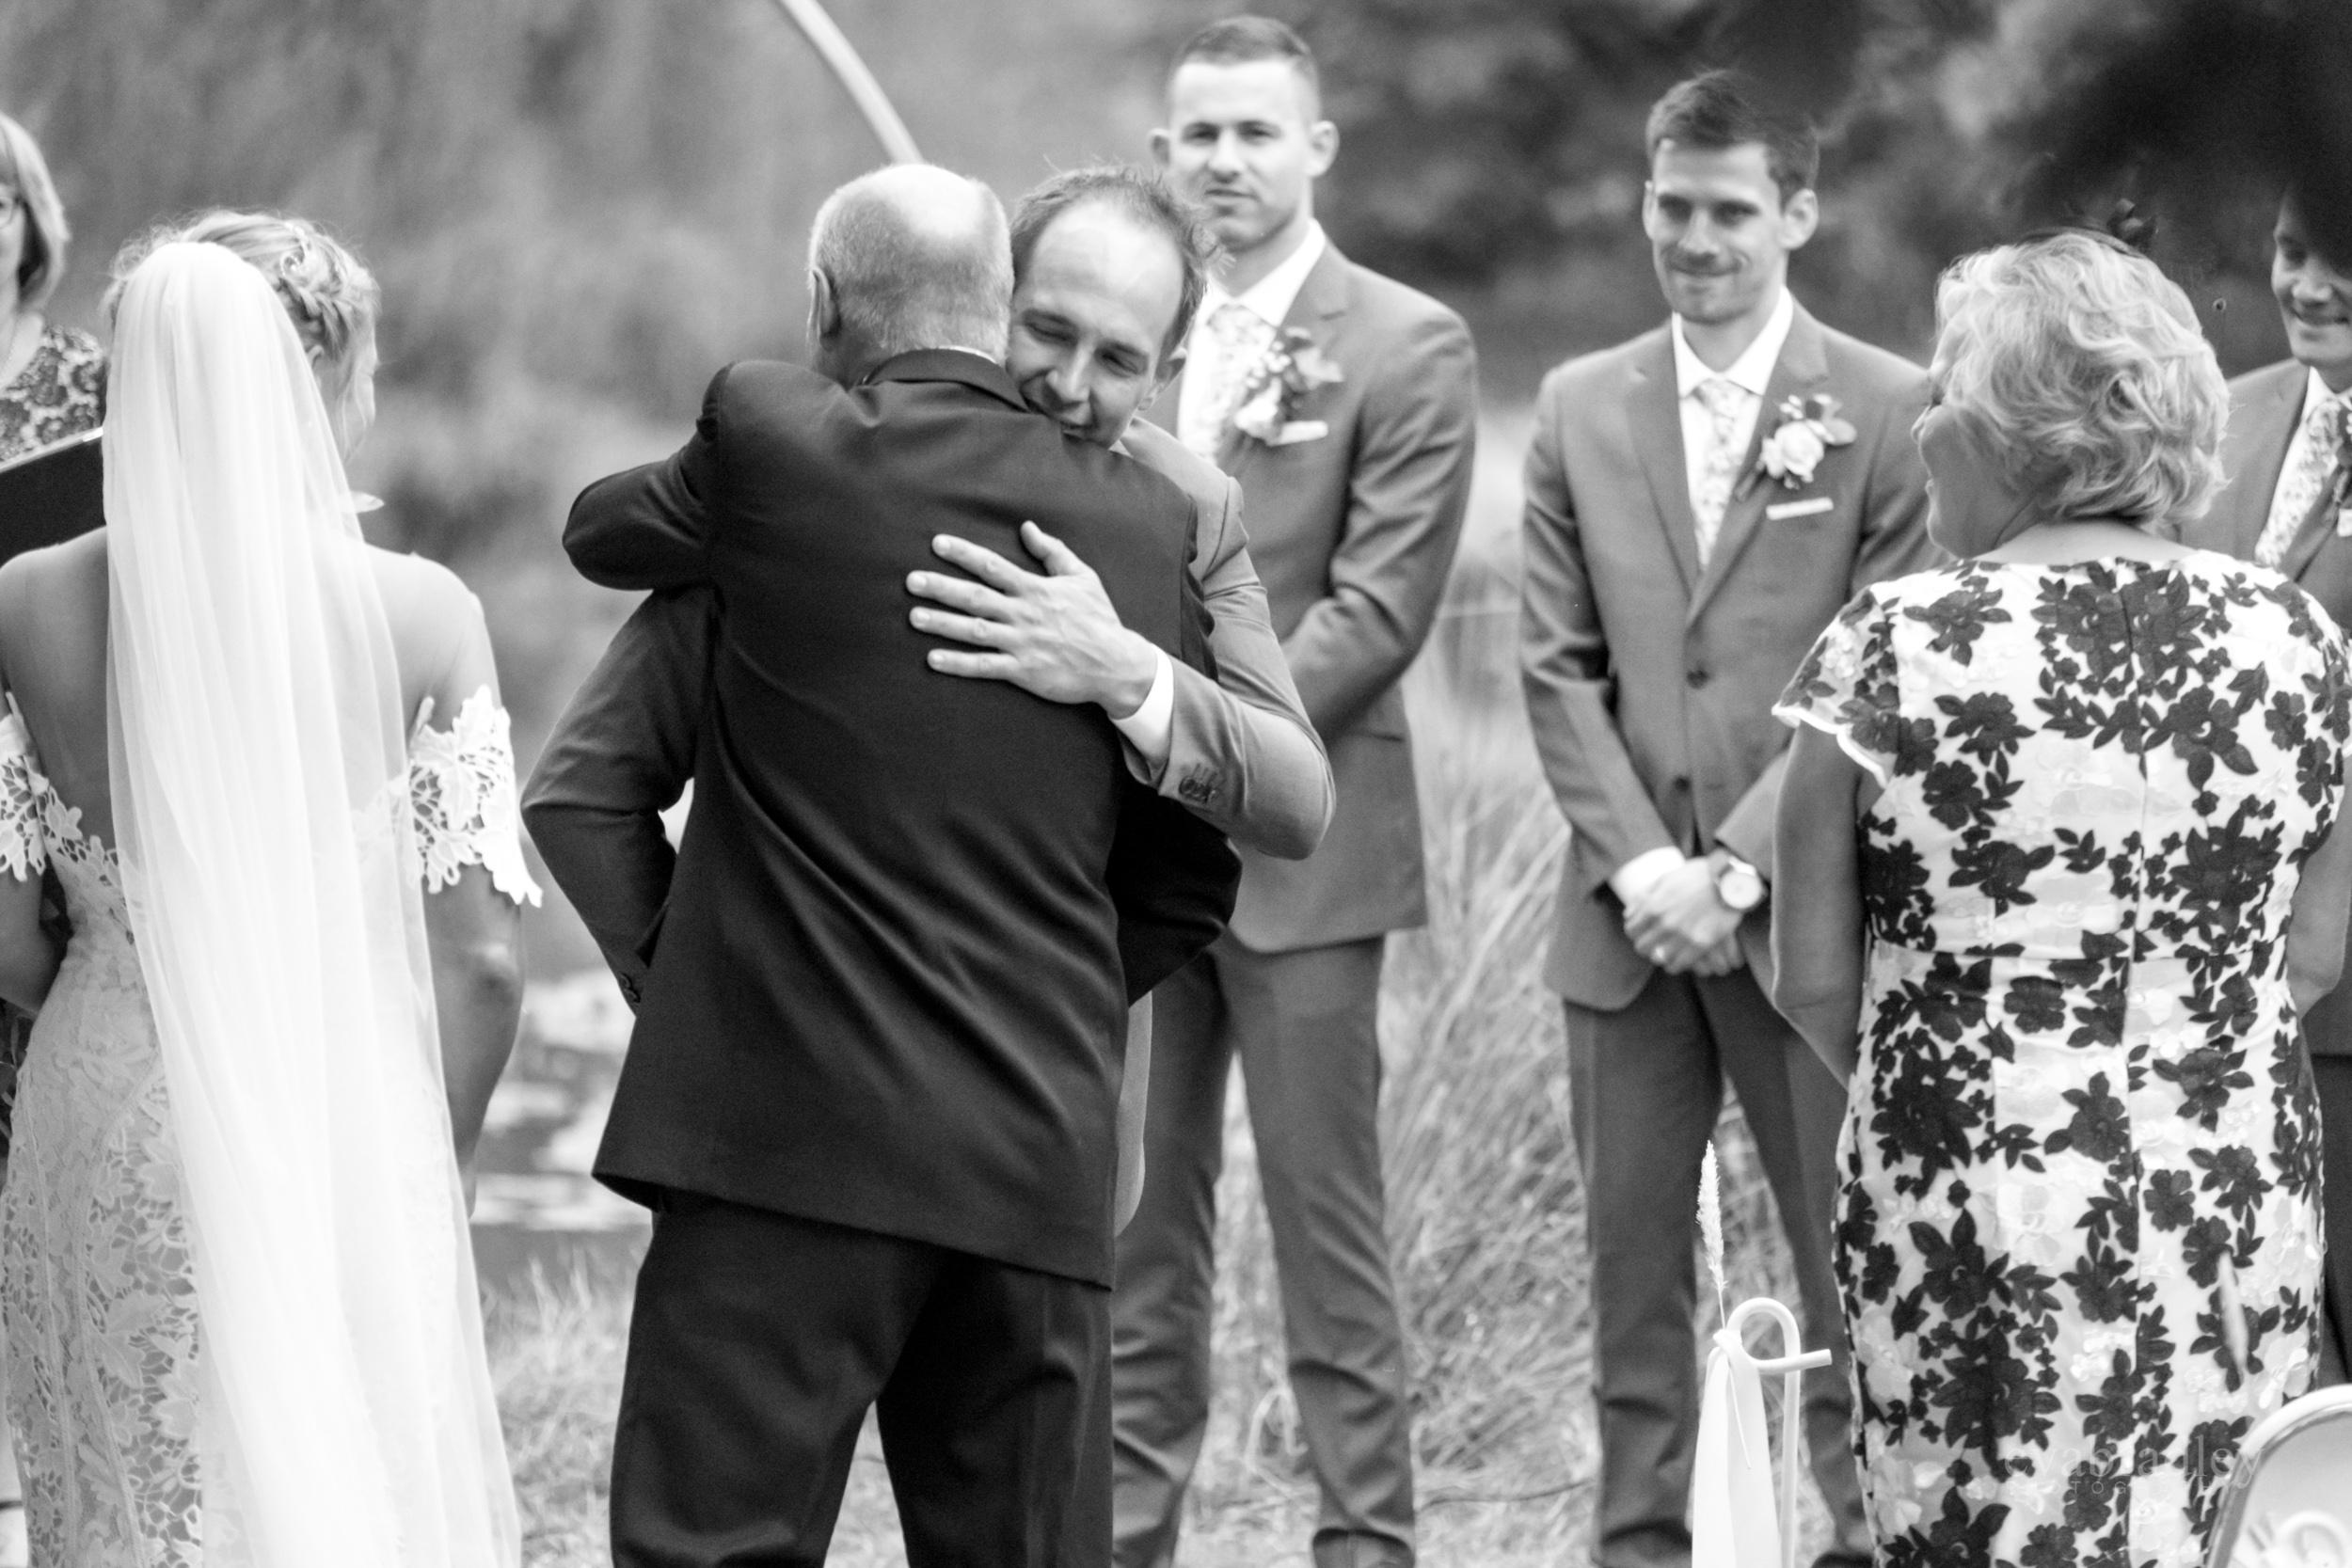 central-hawkes-bay-wedding-venues-nz